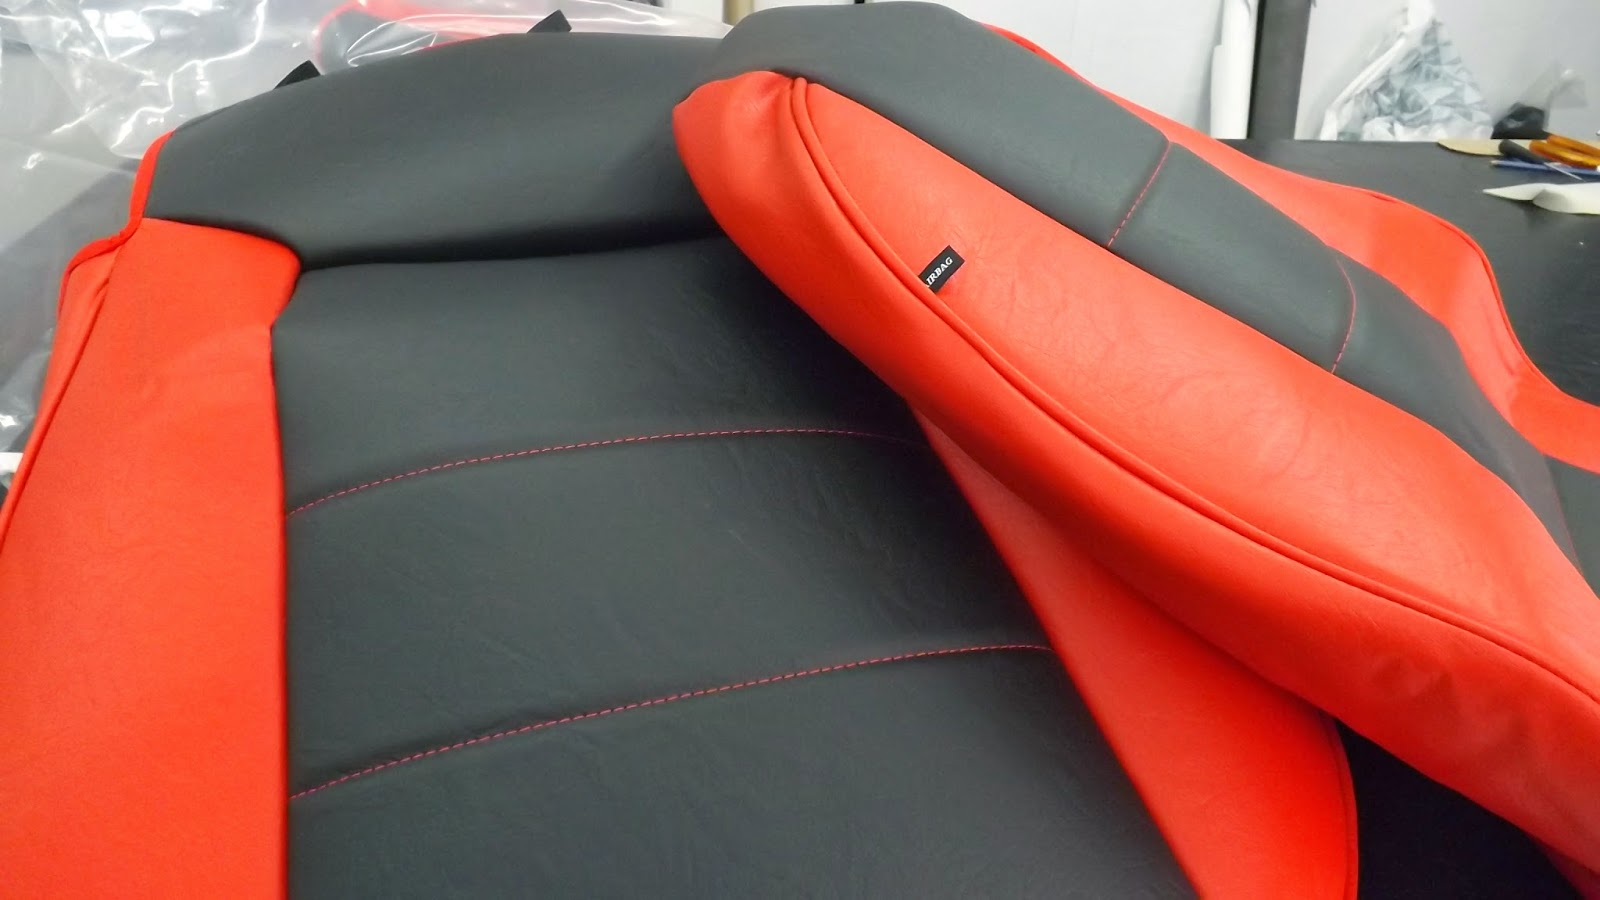 Tapizar asientos coche polipiel awesome tapizar asientos for Tapizar asientos coche barcelona